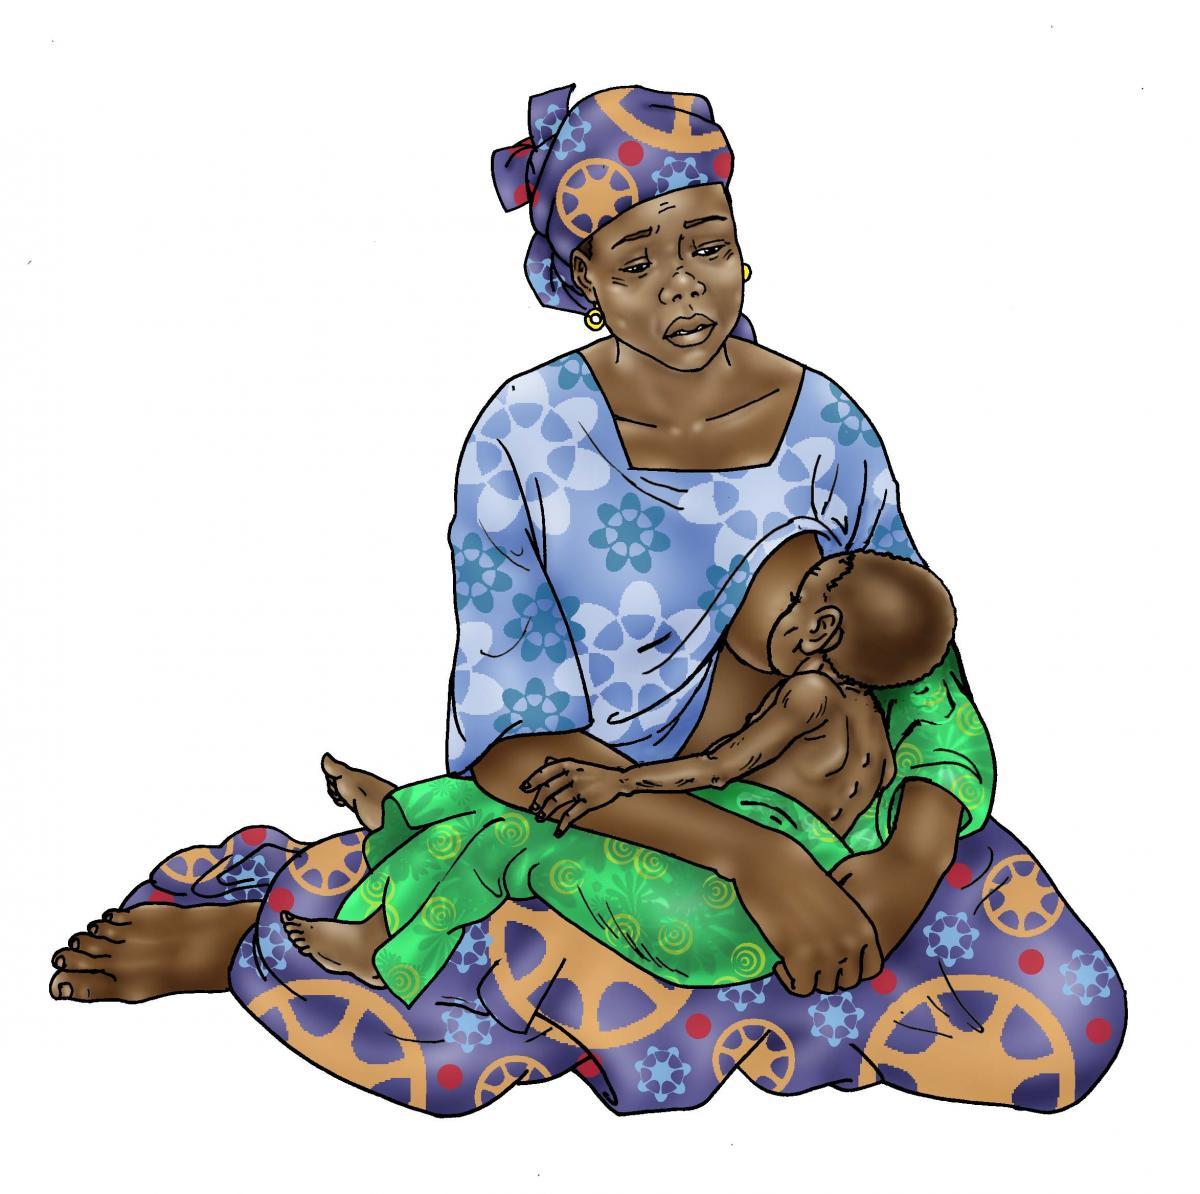 Sick Baby Nutrition - Mother breastfeeding sick baby 0-24 mo - 01 - Niger